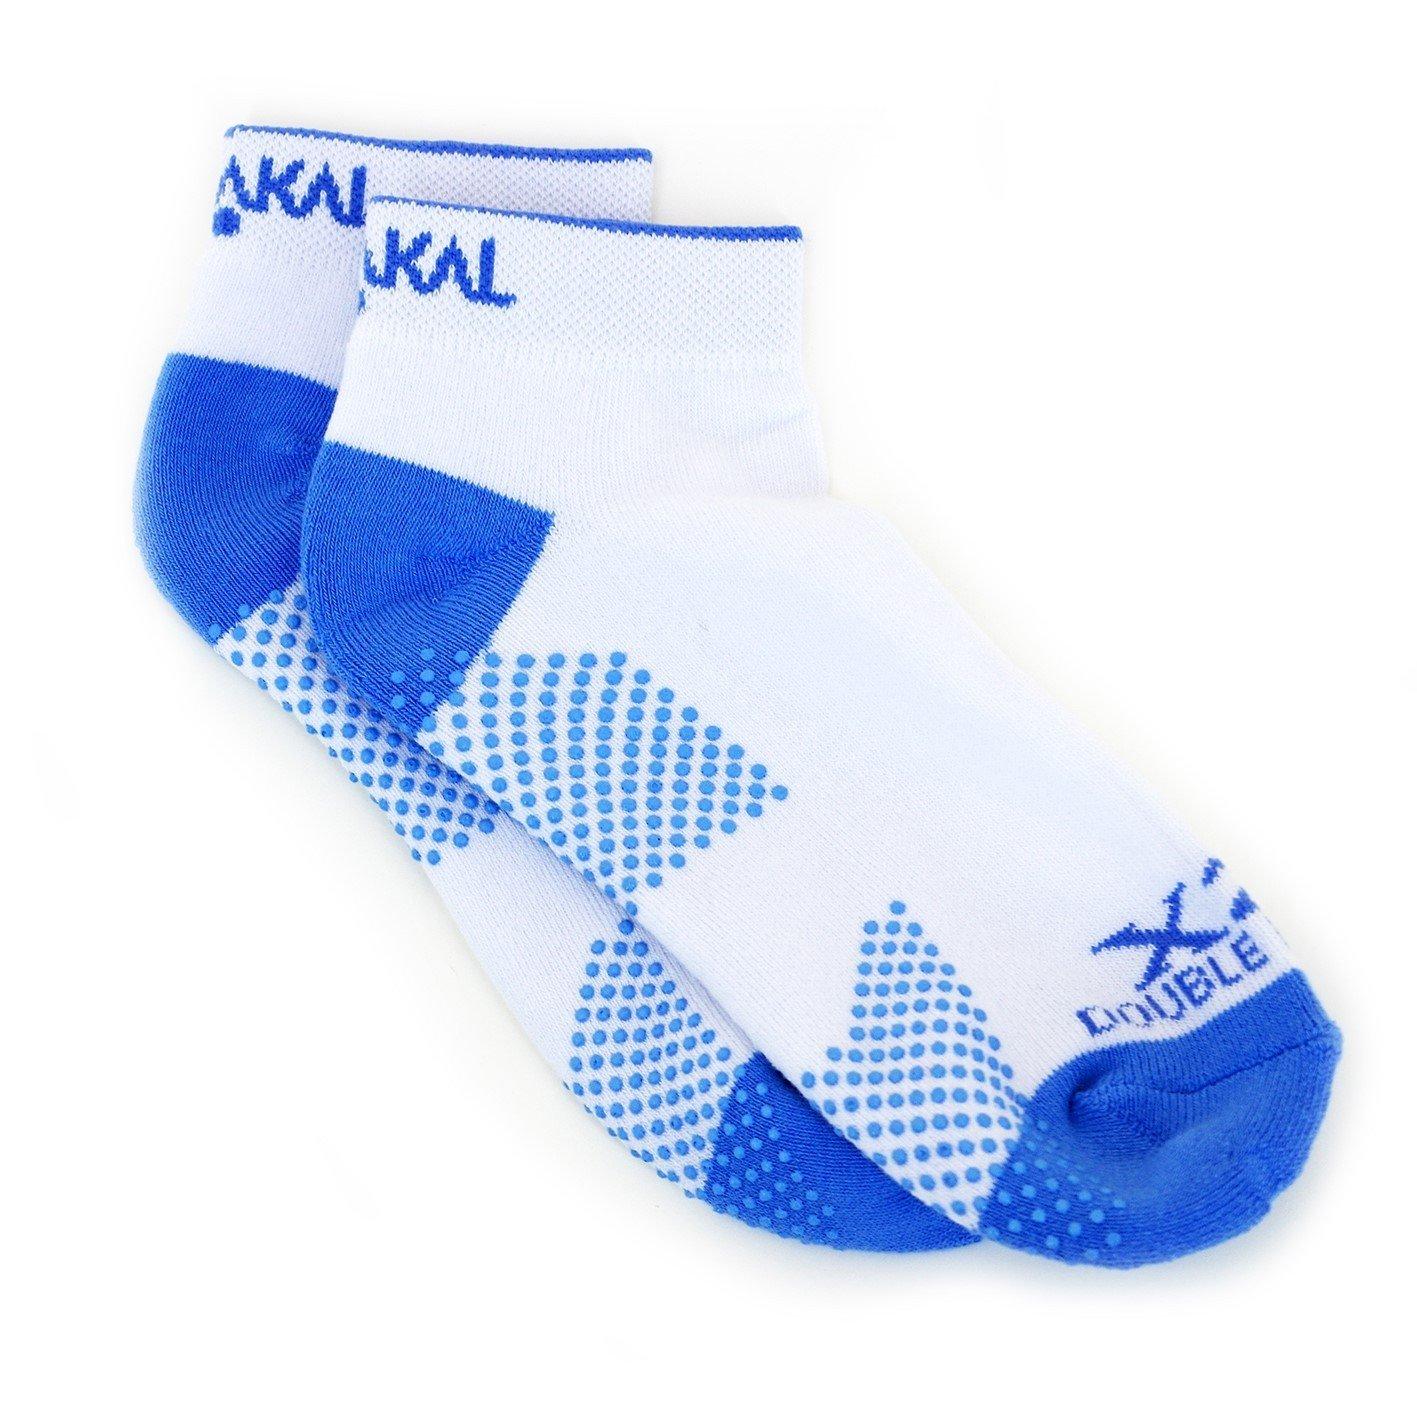 Karakal X2+ Ladies Trainer Socks - White and Blue